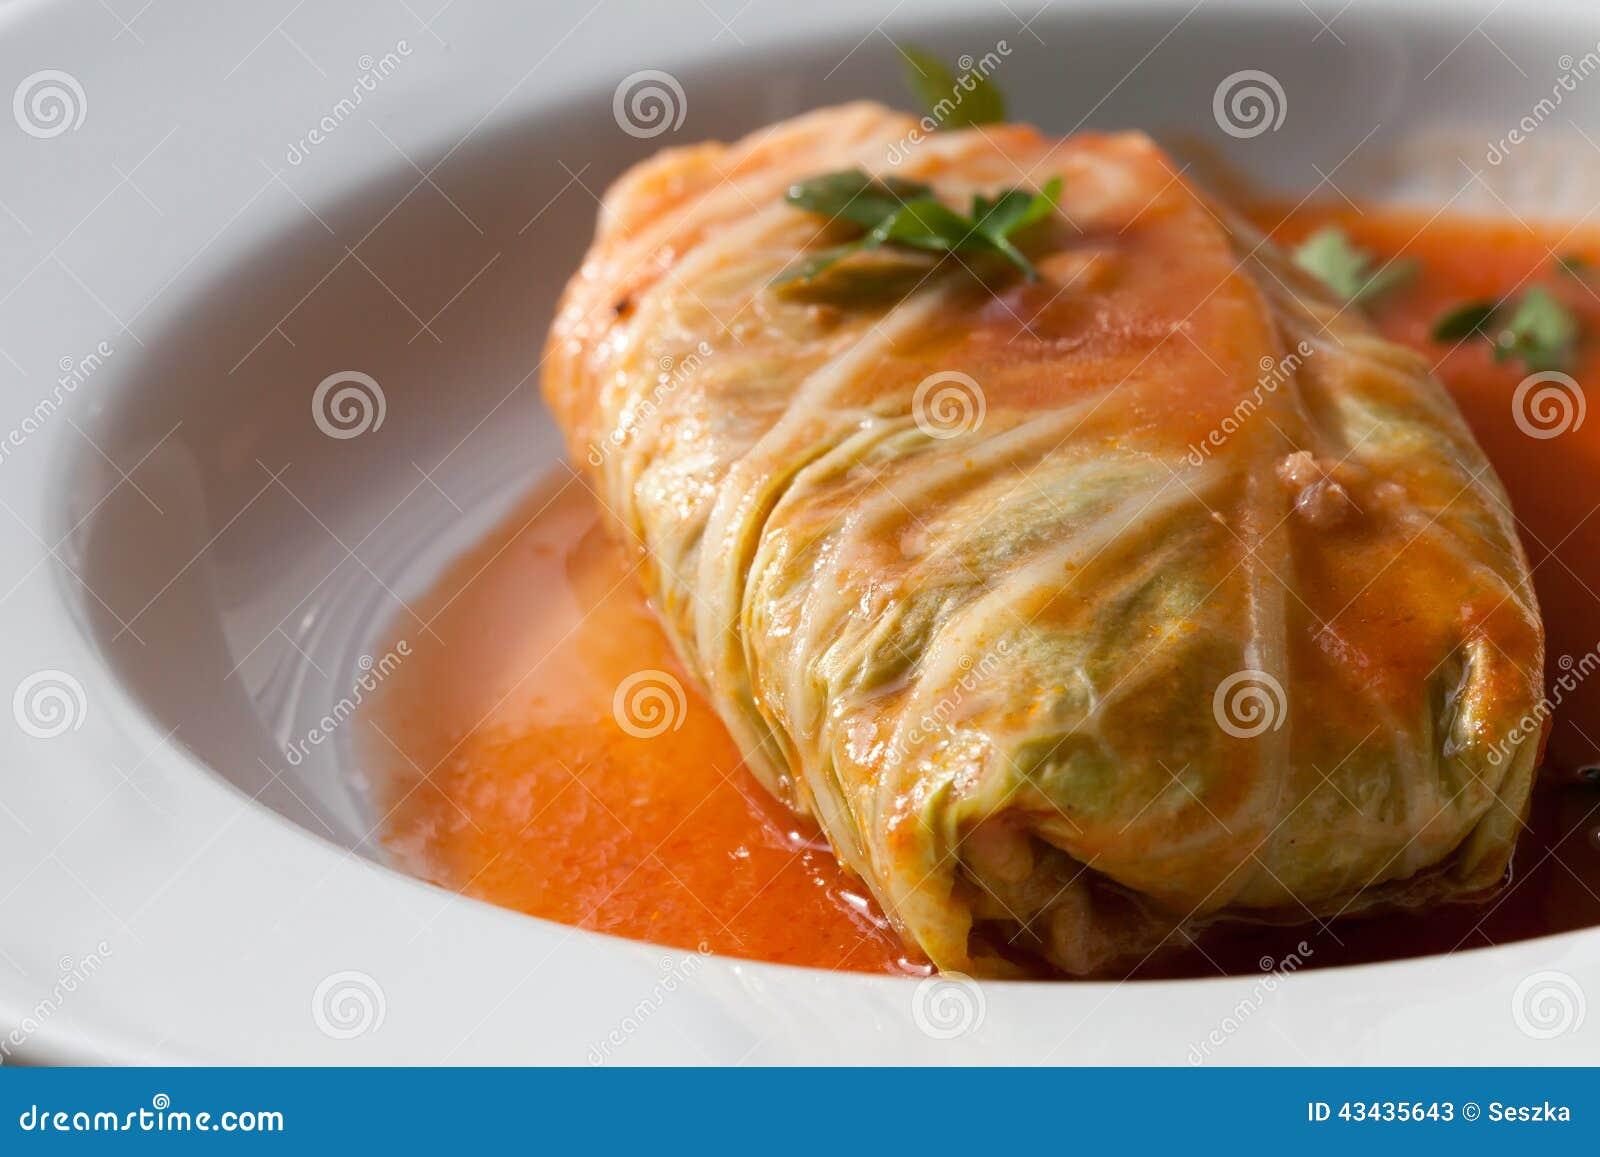 Polish Food Stock Photo Image 43435643